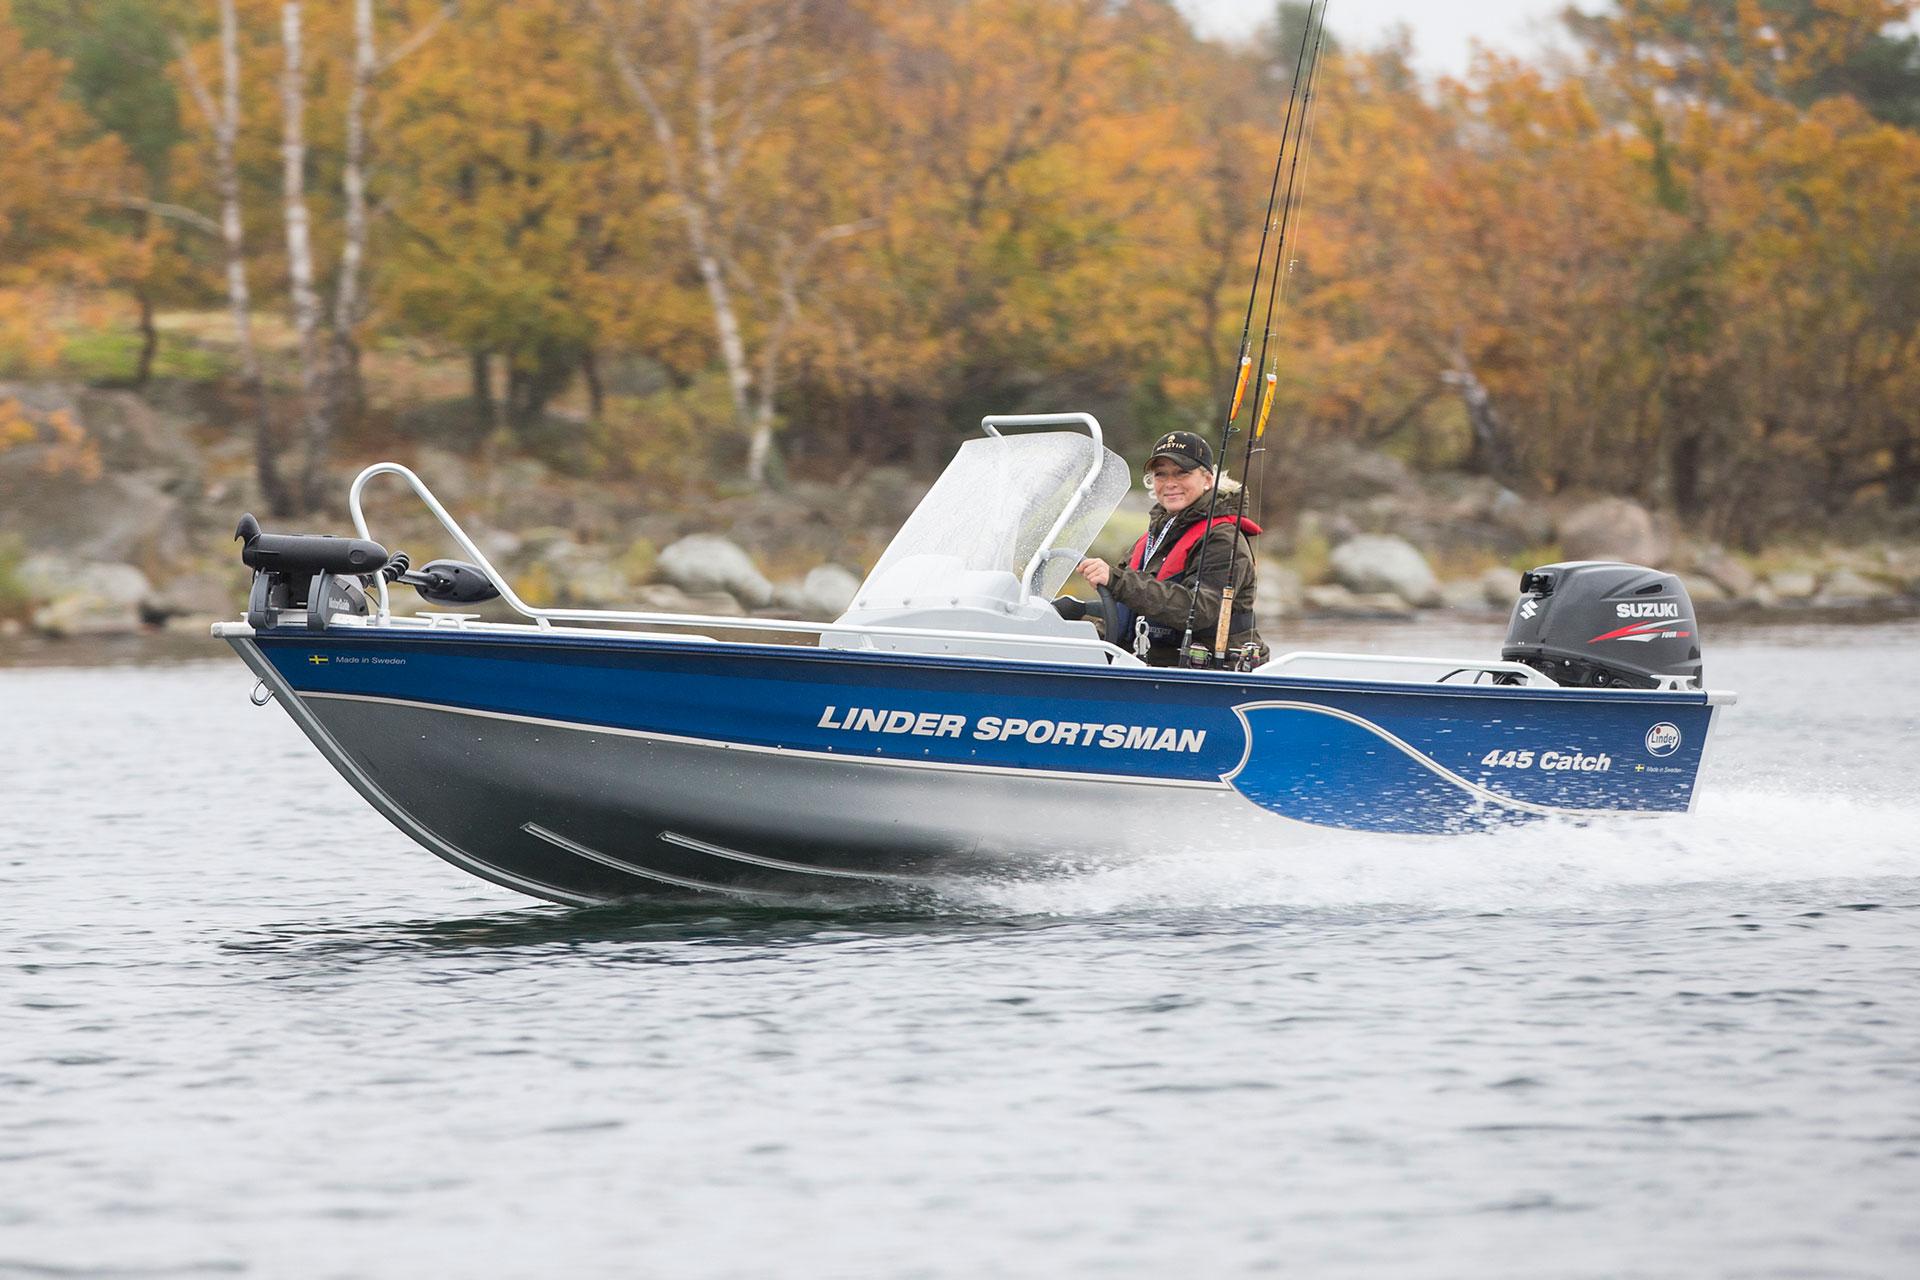 linder445-sportsman-fiskebat